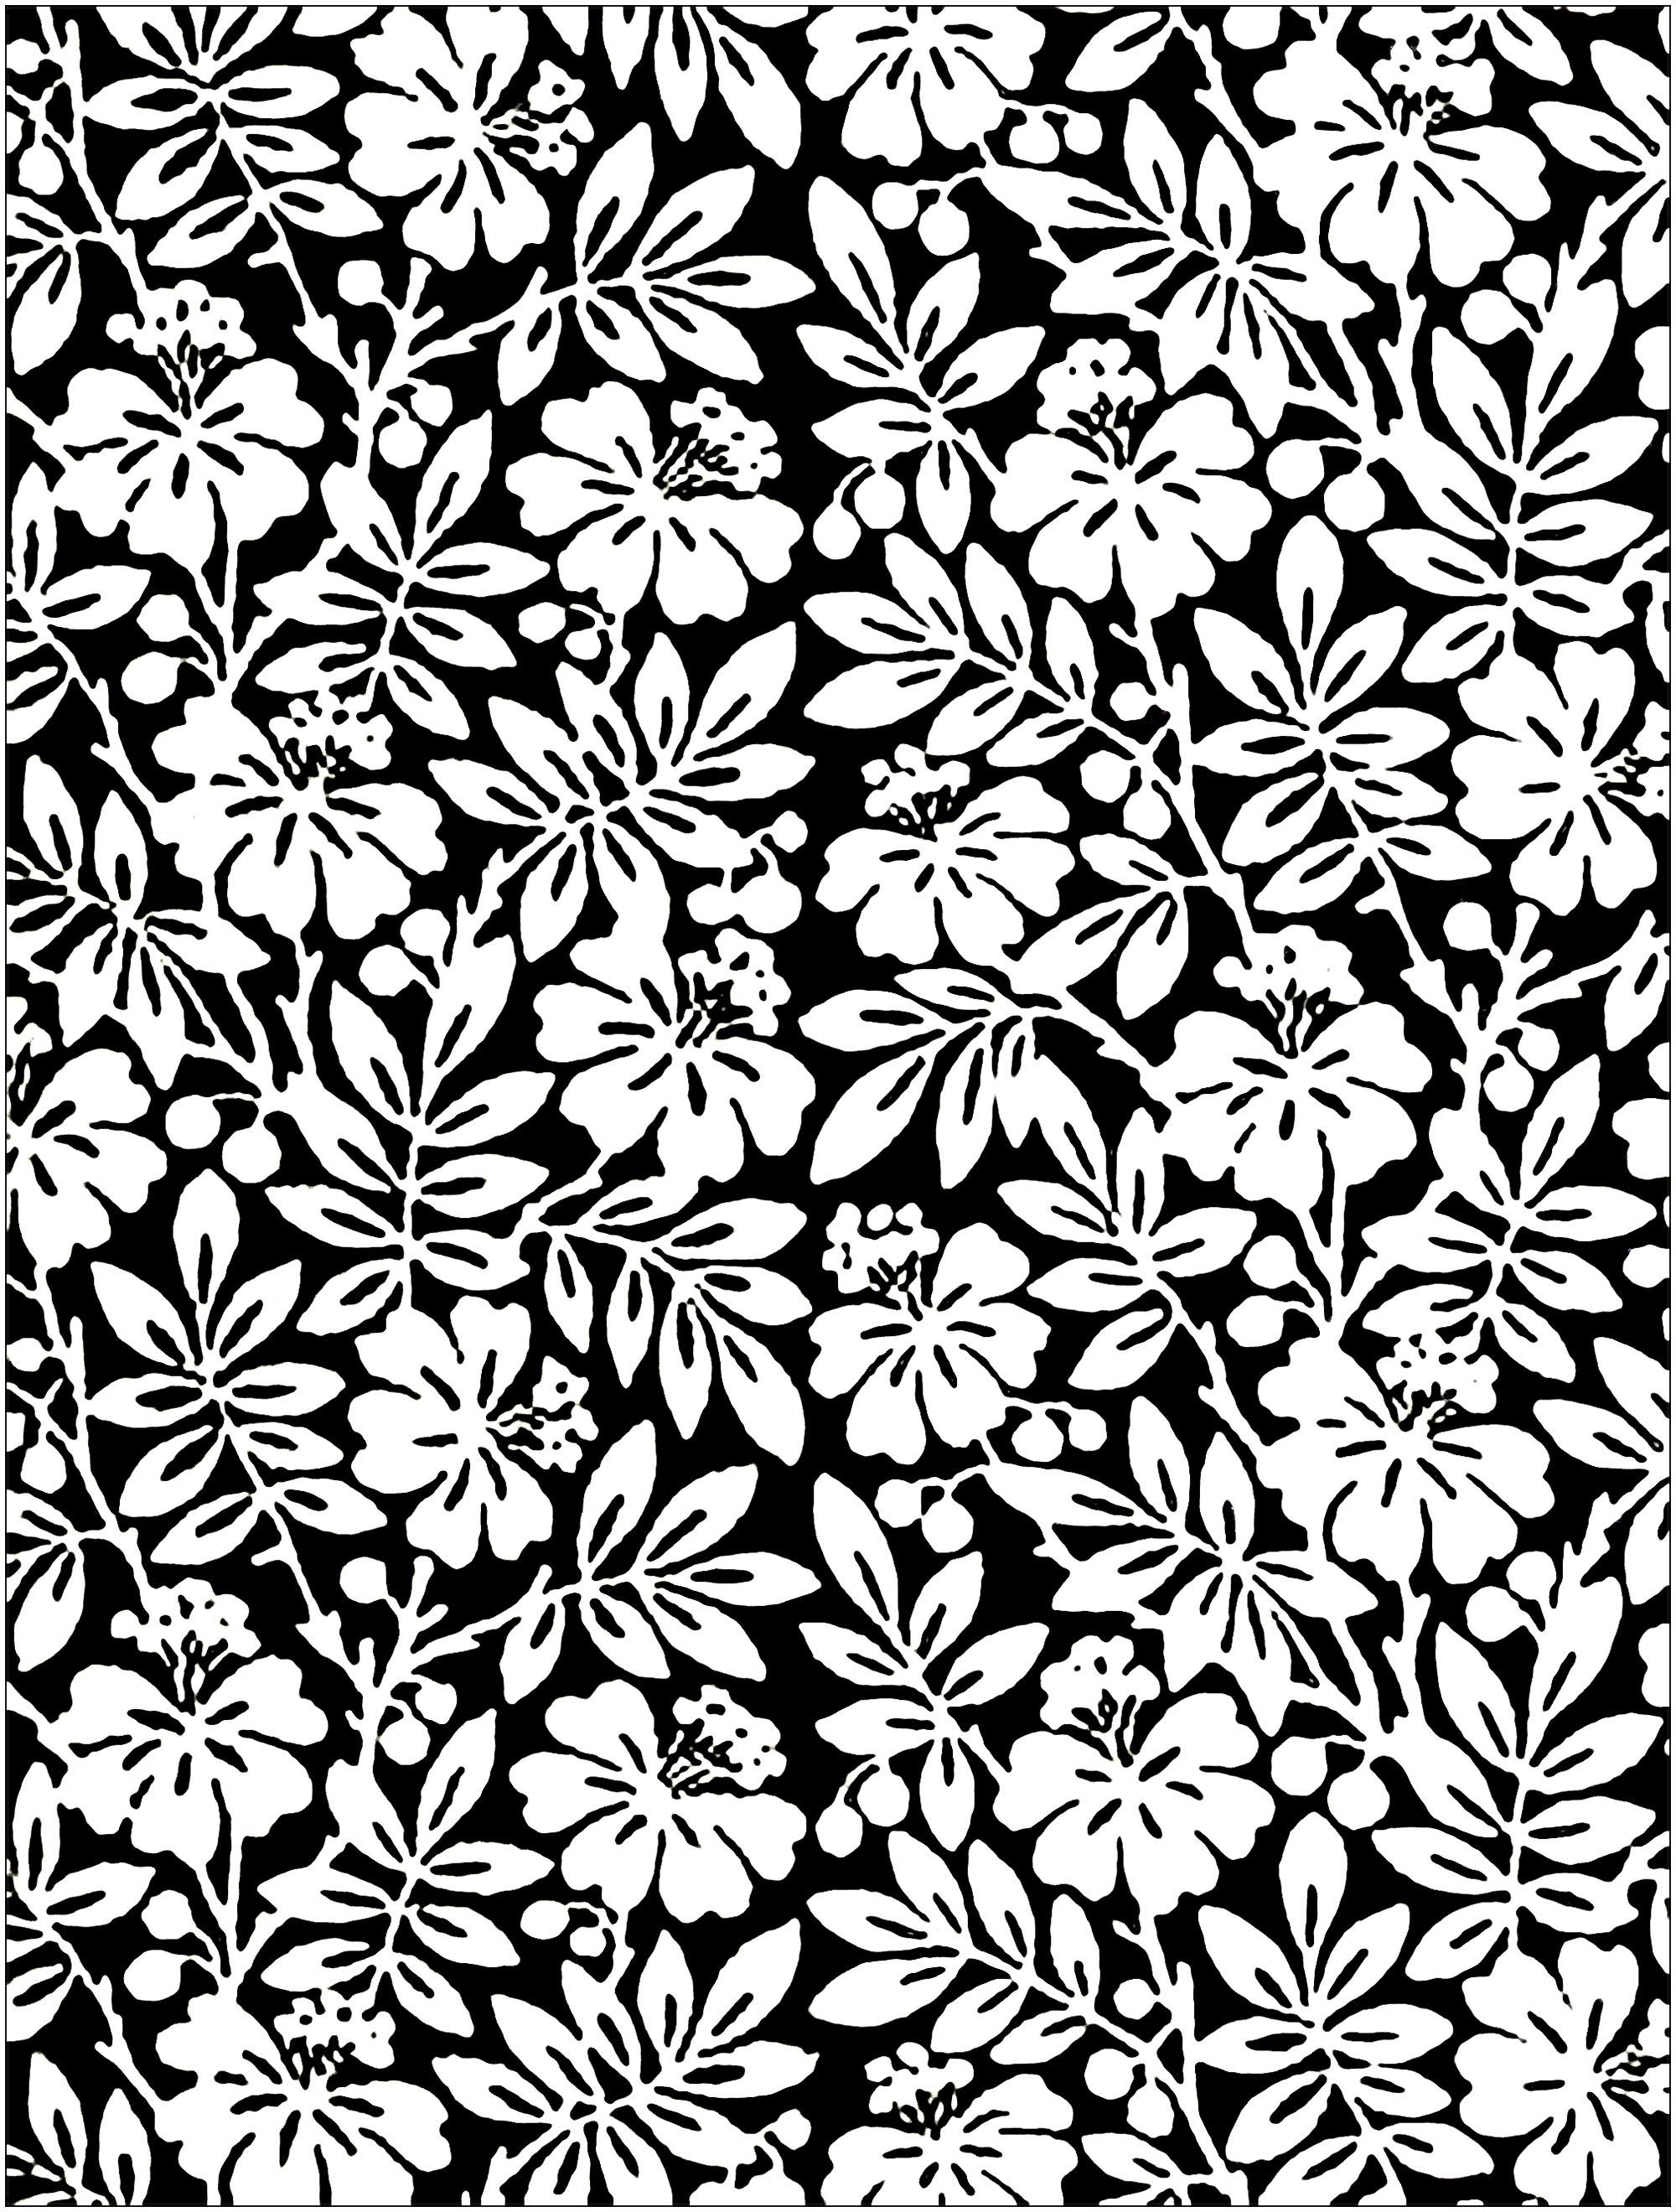 Blumen vegetation 68700